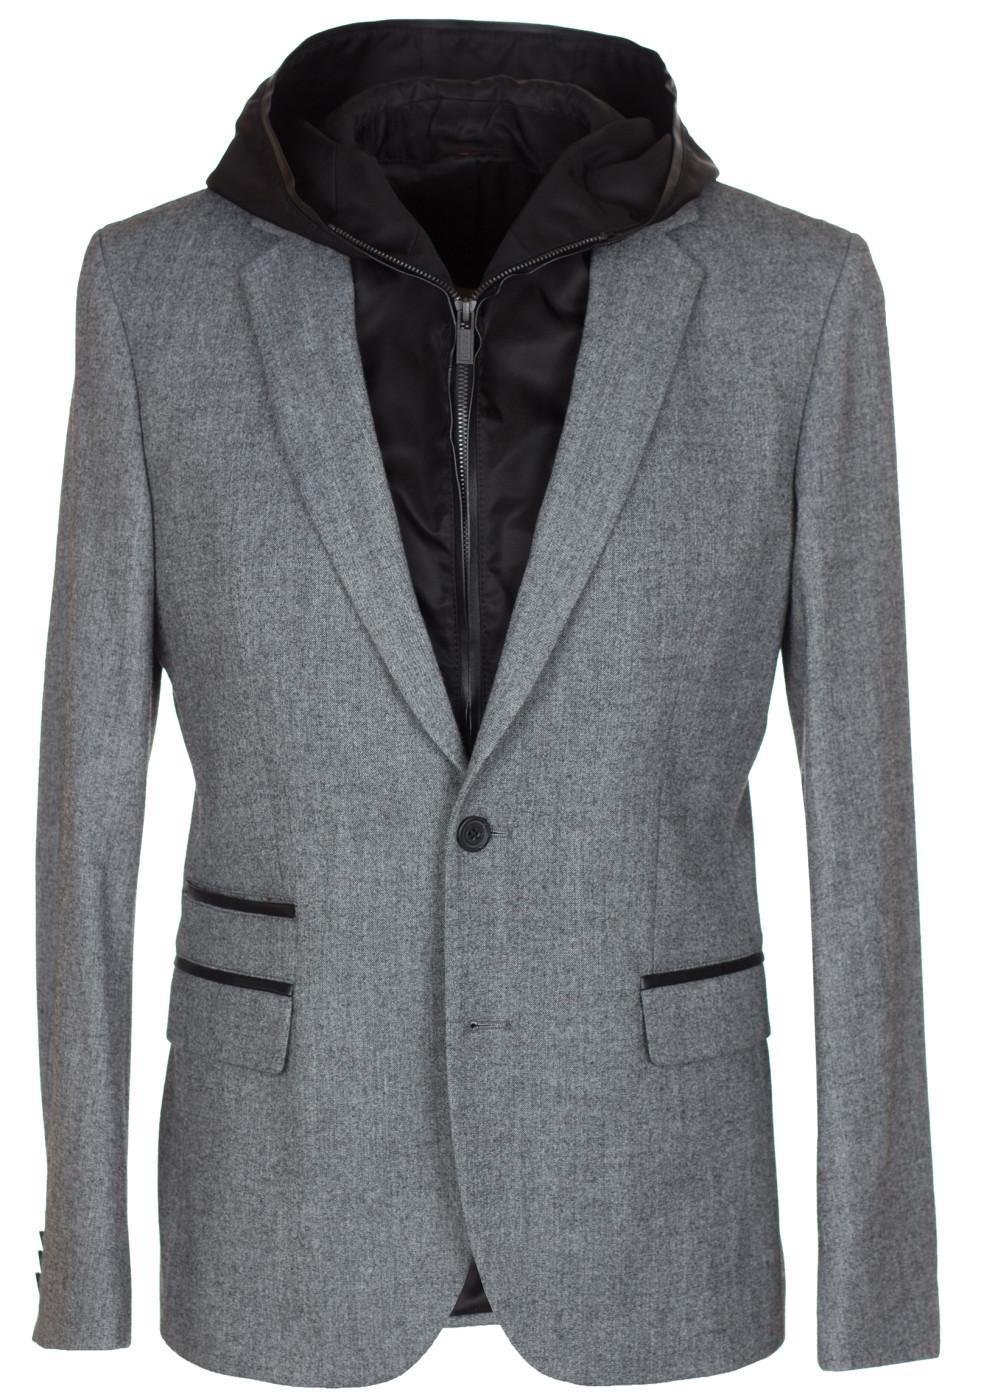 0bb0facbd Hugo Boss 2 Piece Detachable Hooded Blazer Jacket Sport Coat US ...